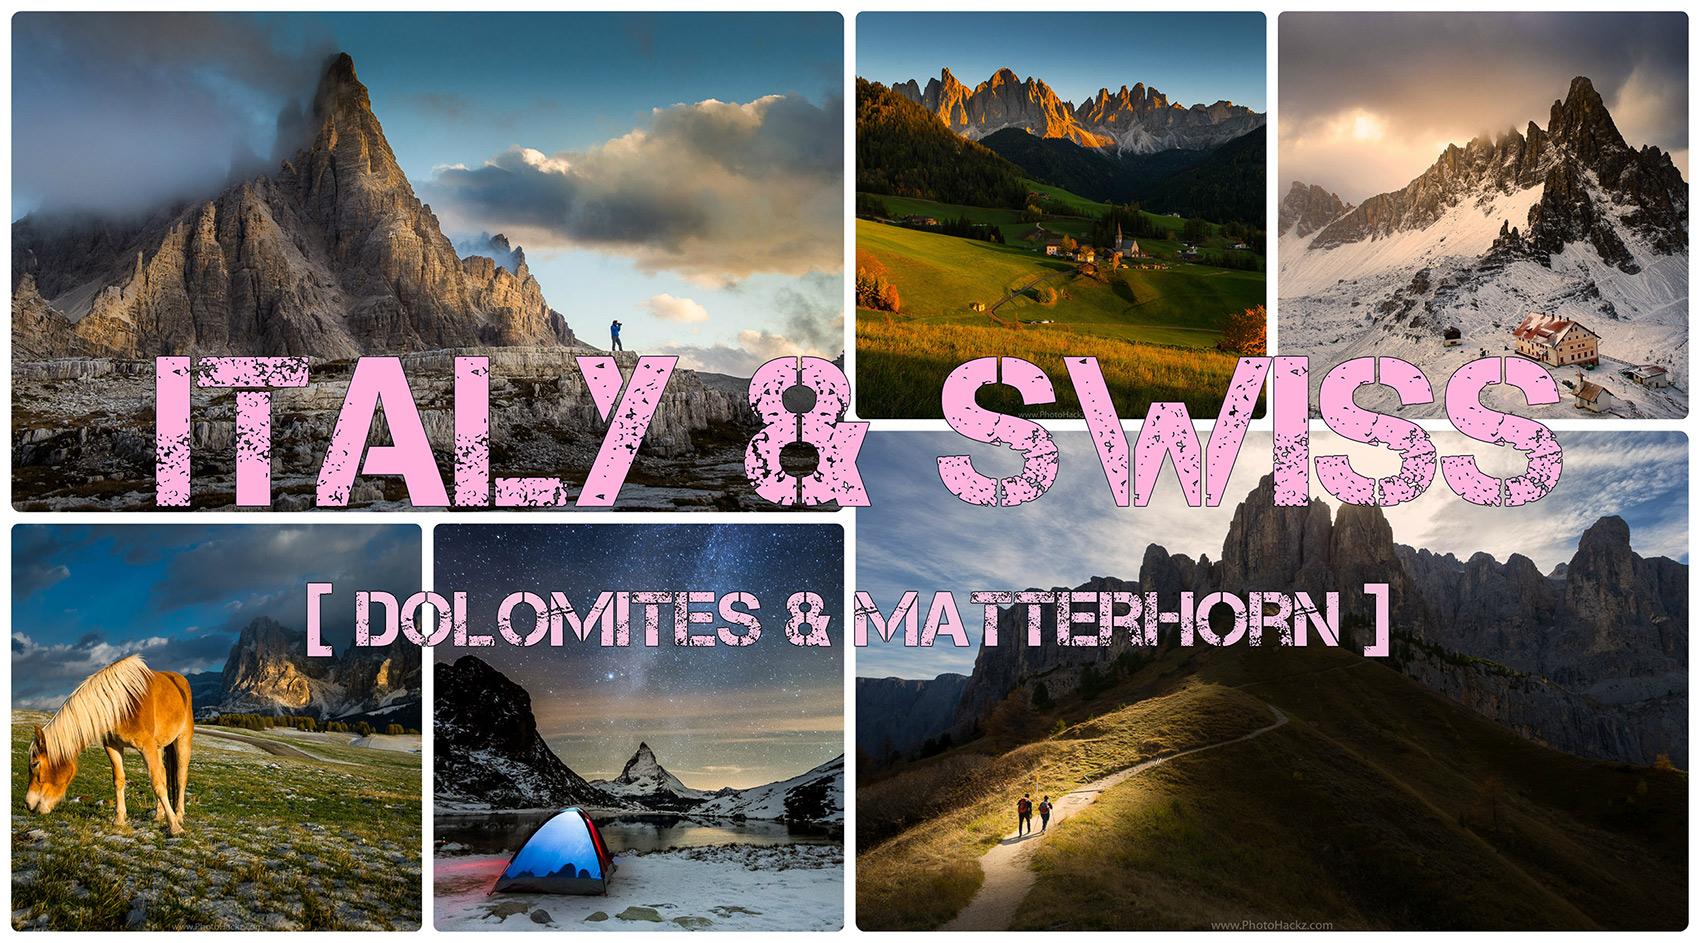 Autumn time in Italy and Switzerland  [ Dolomites & Matterhorn]